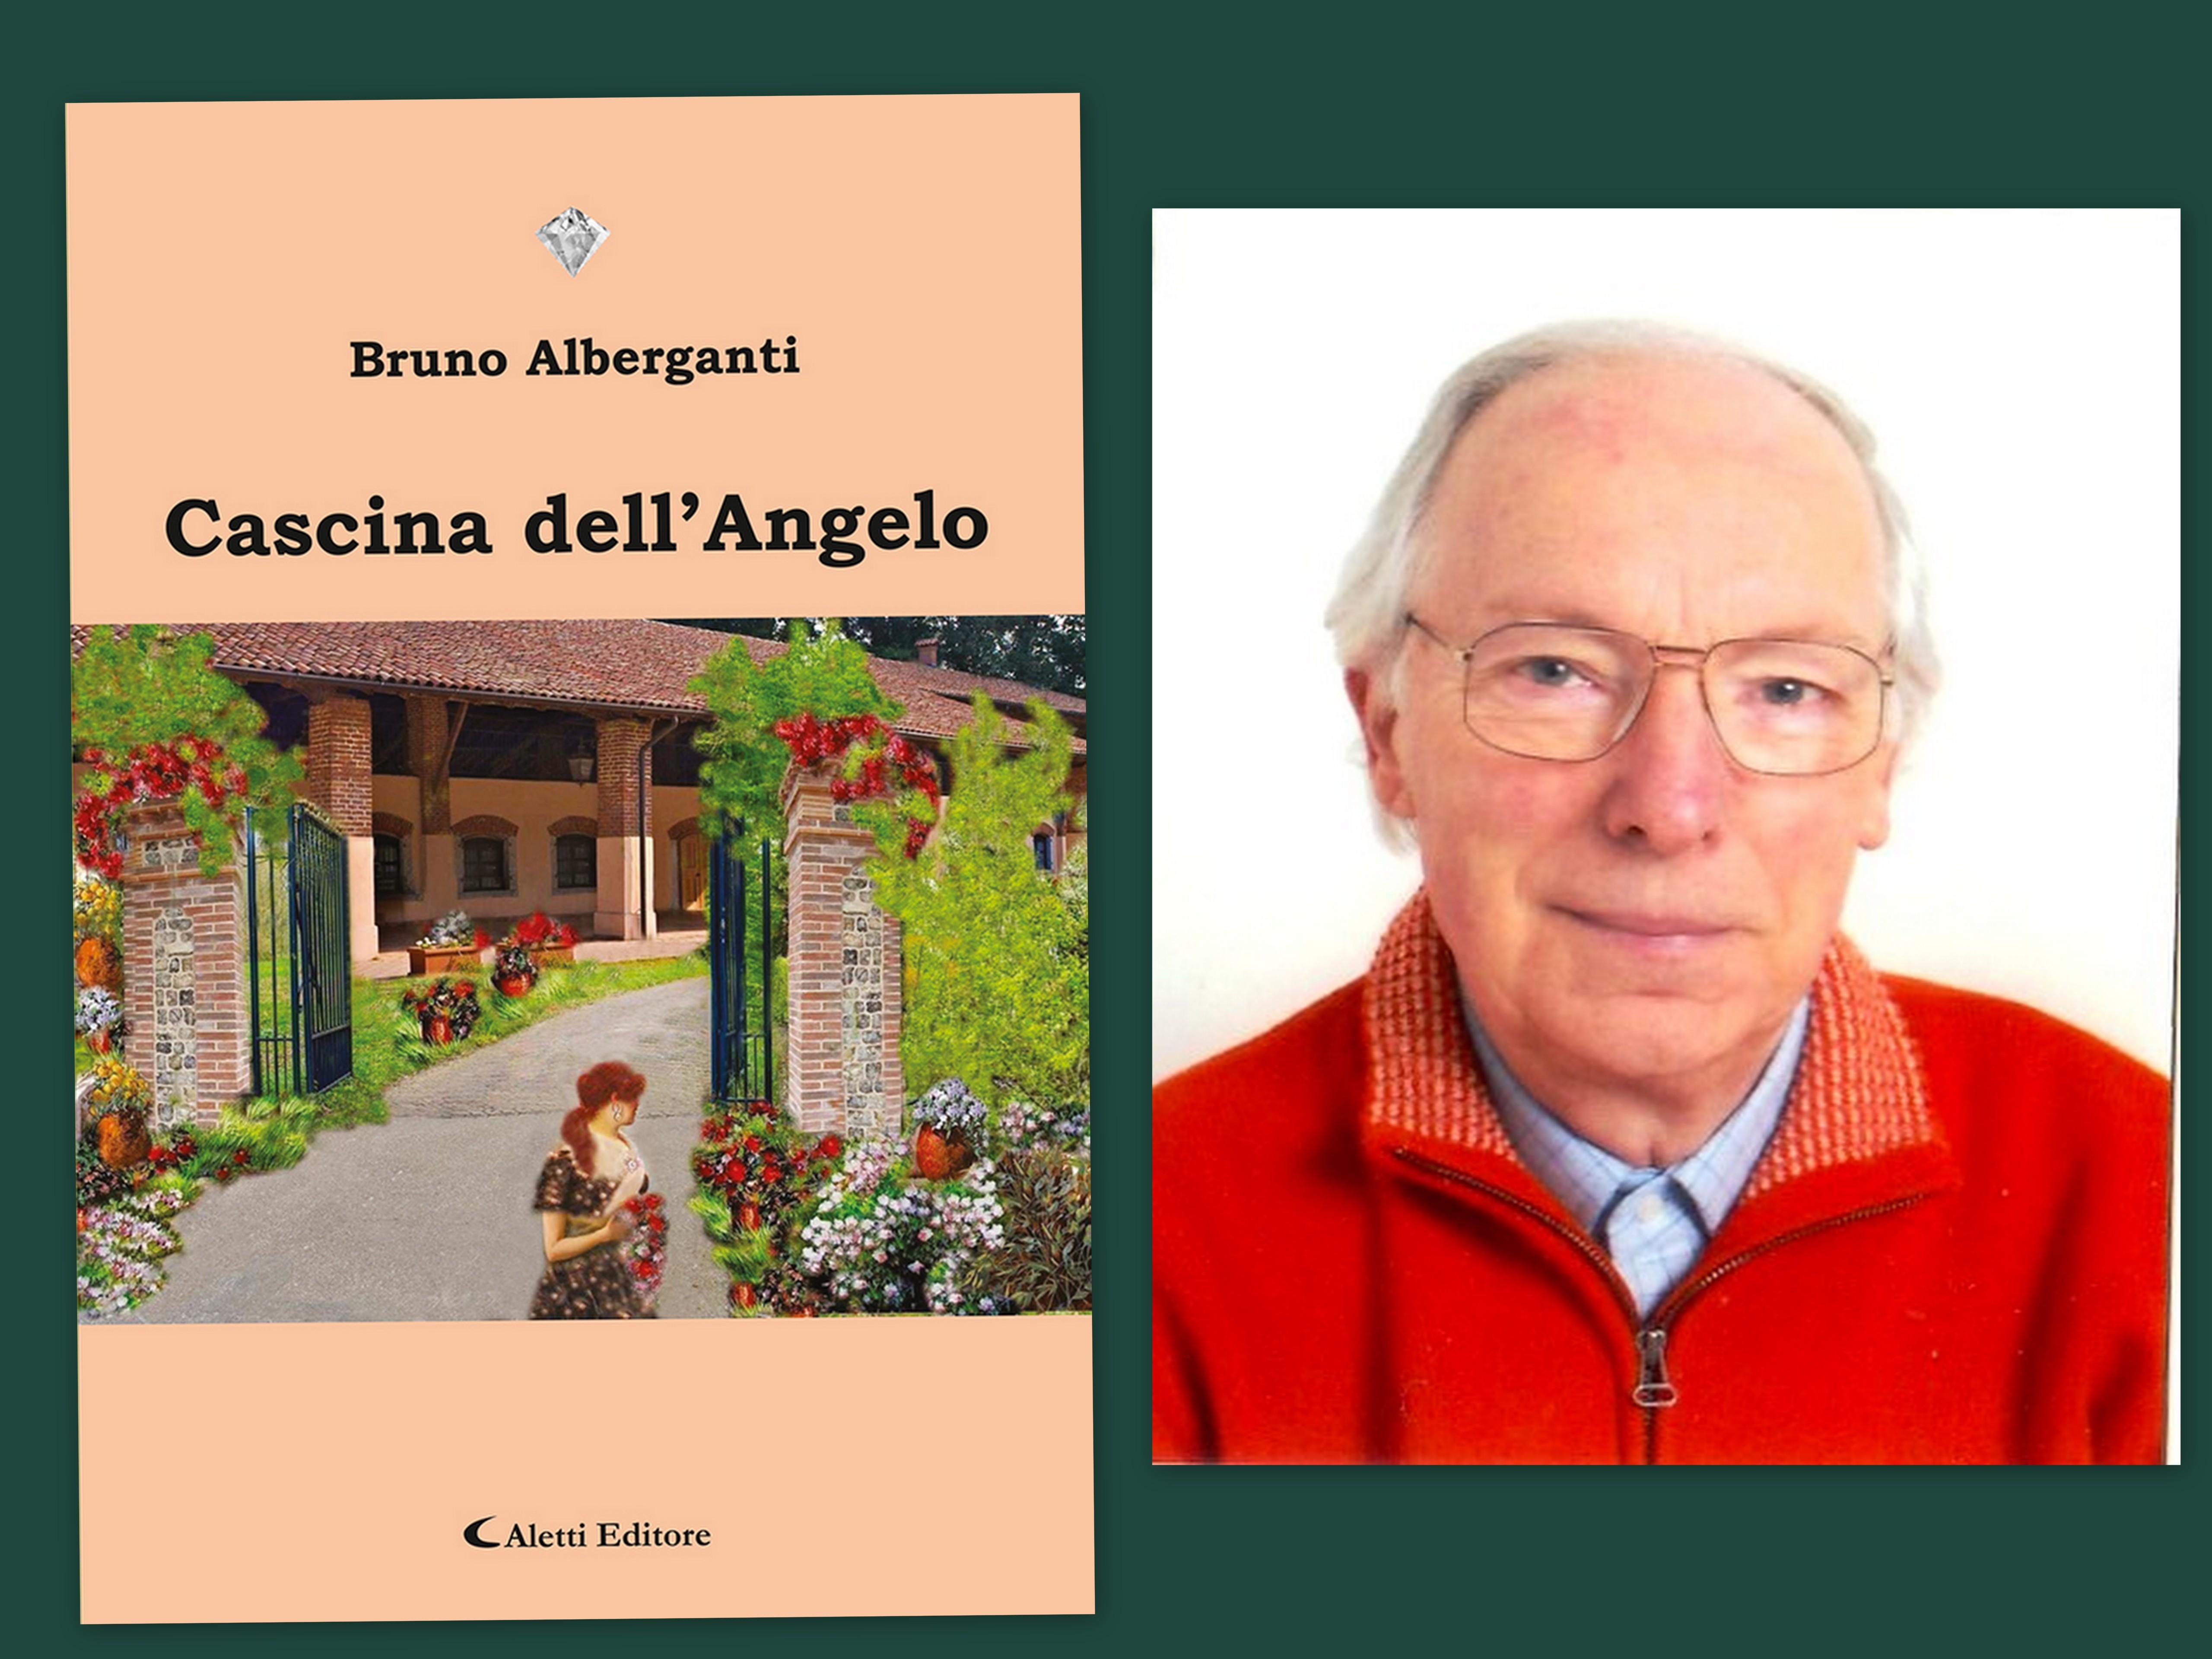 Bruno Alberganti